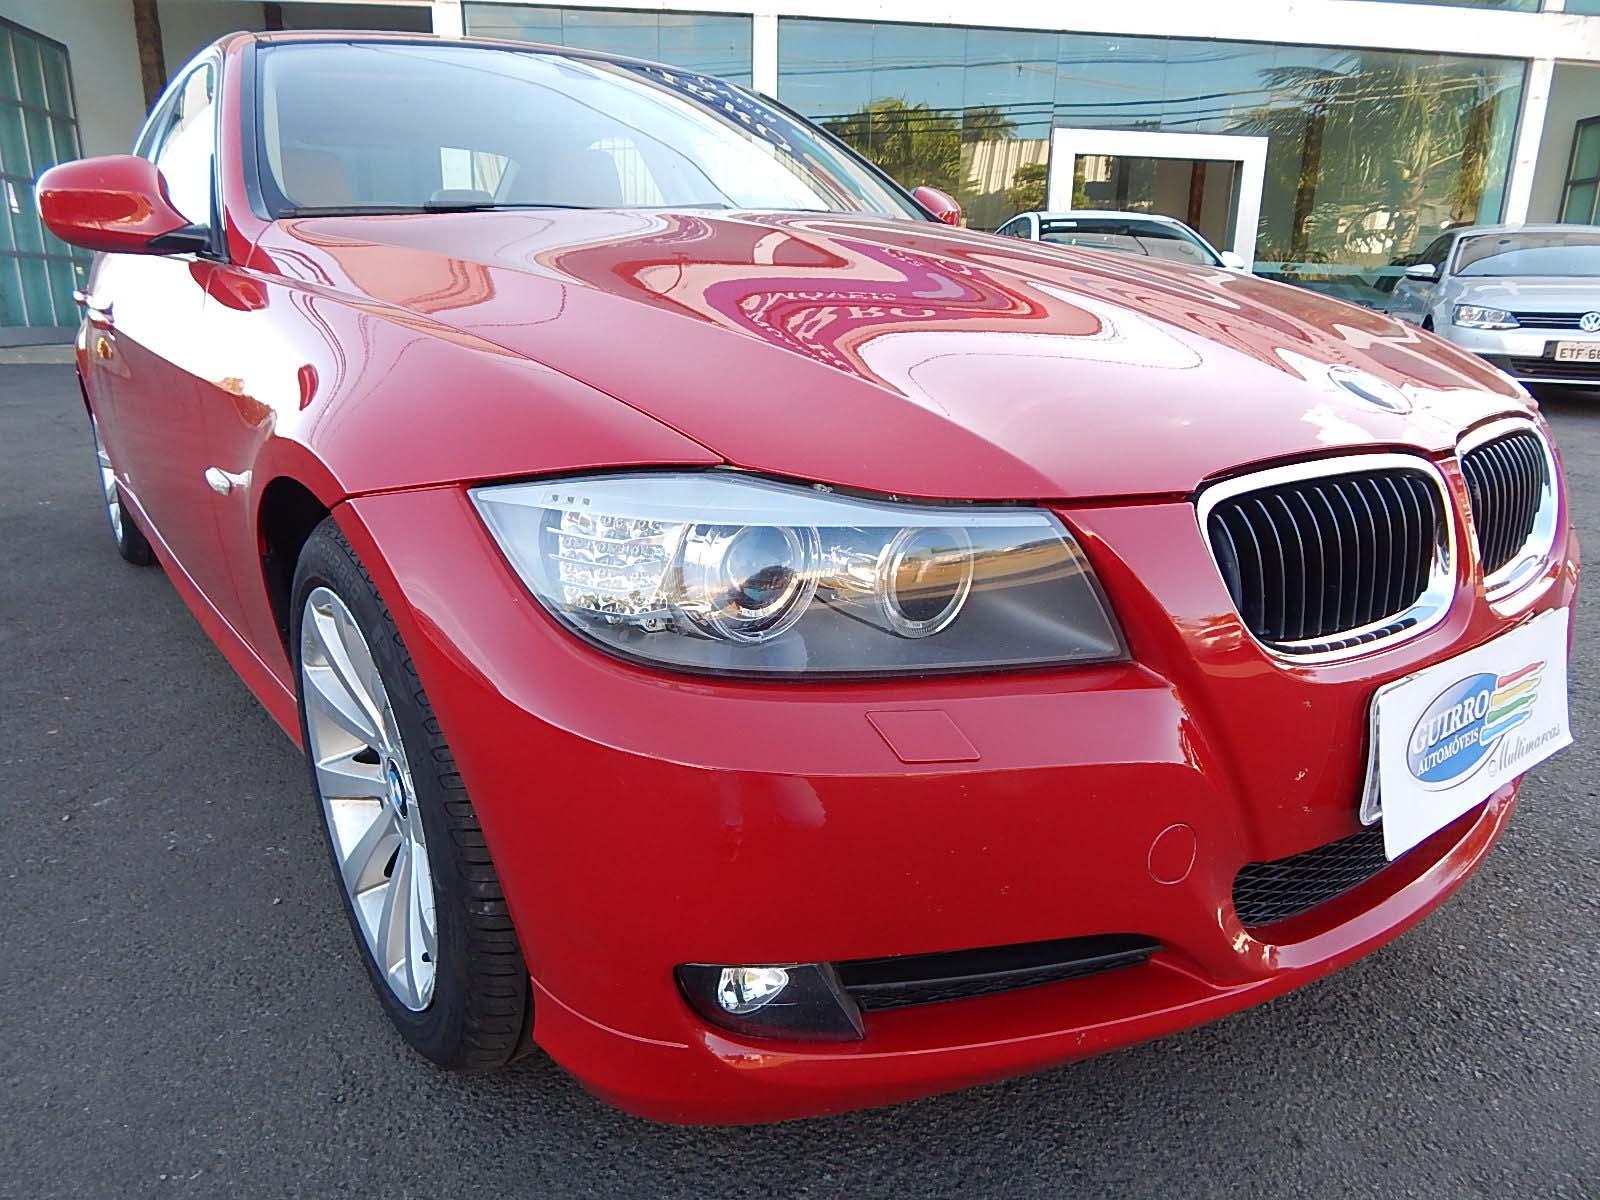 2010/2011 - Gasolina